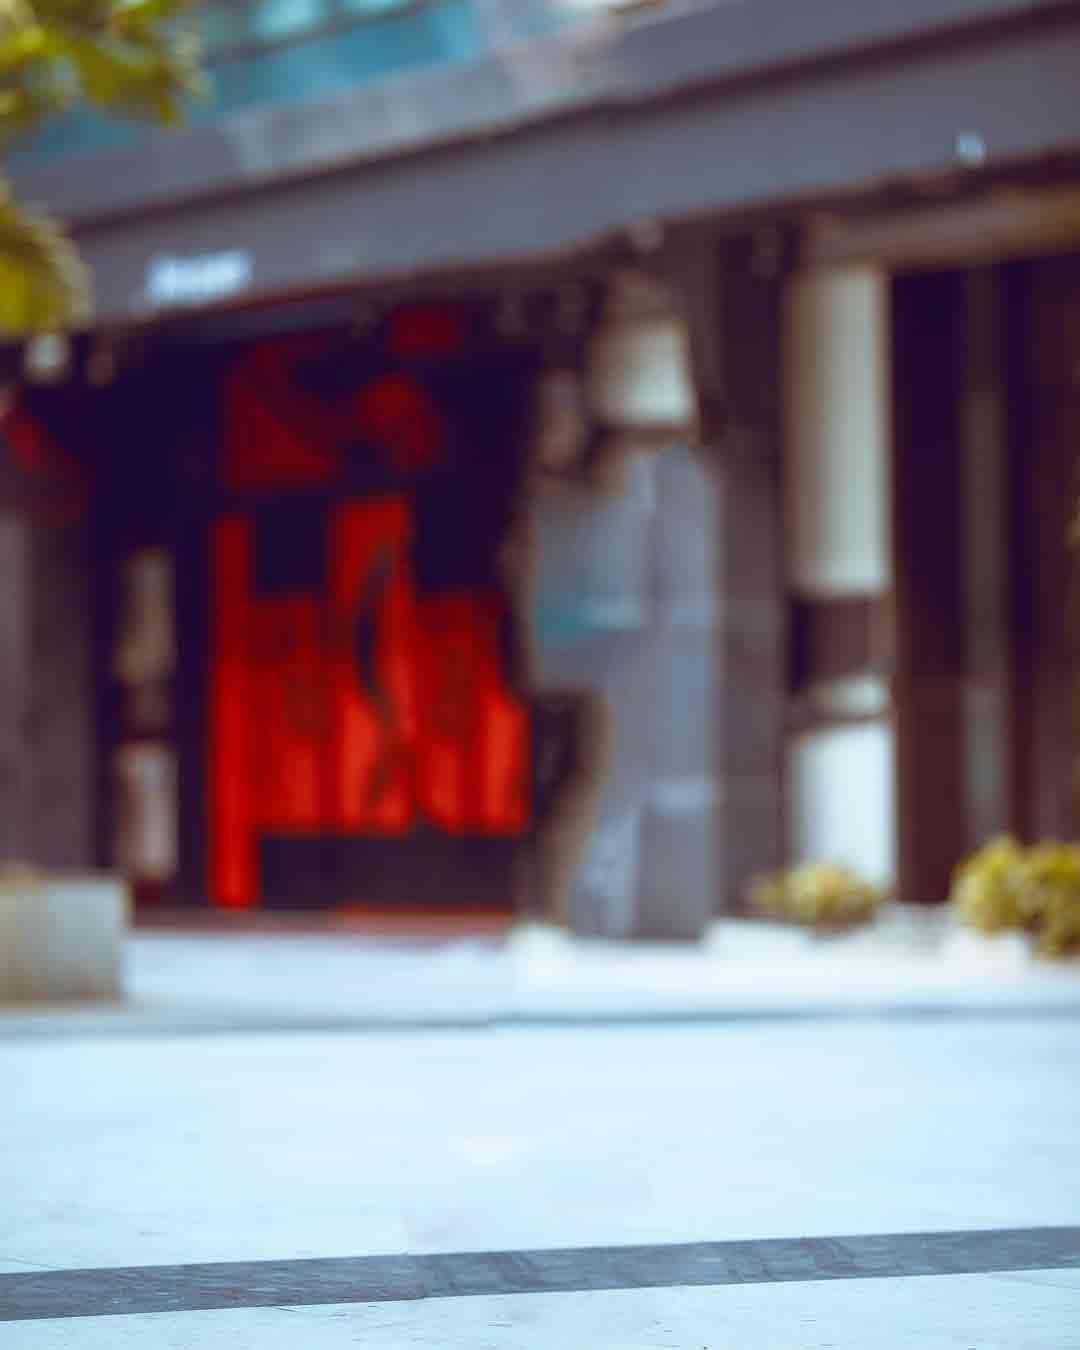 New Cb Background Hd Download 2019 – Fashionsneakers club